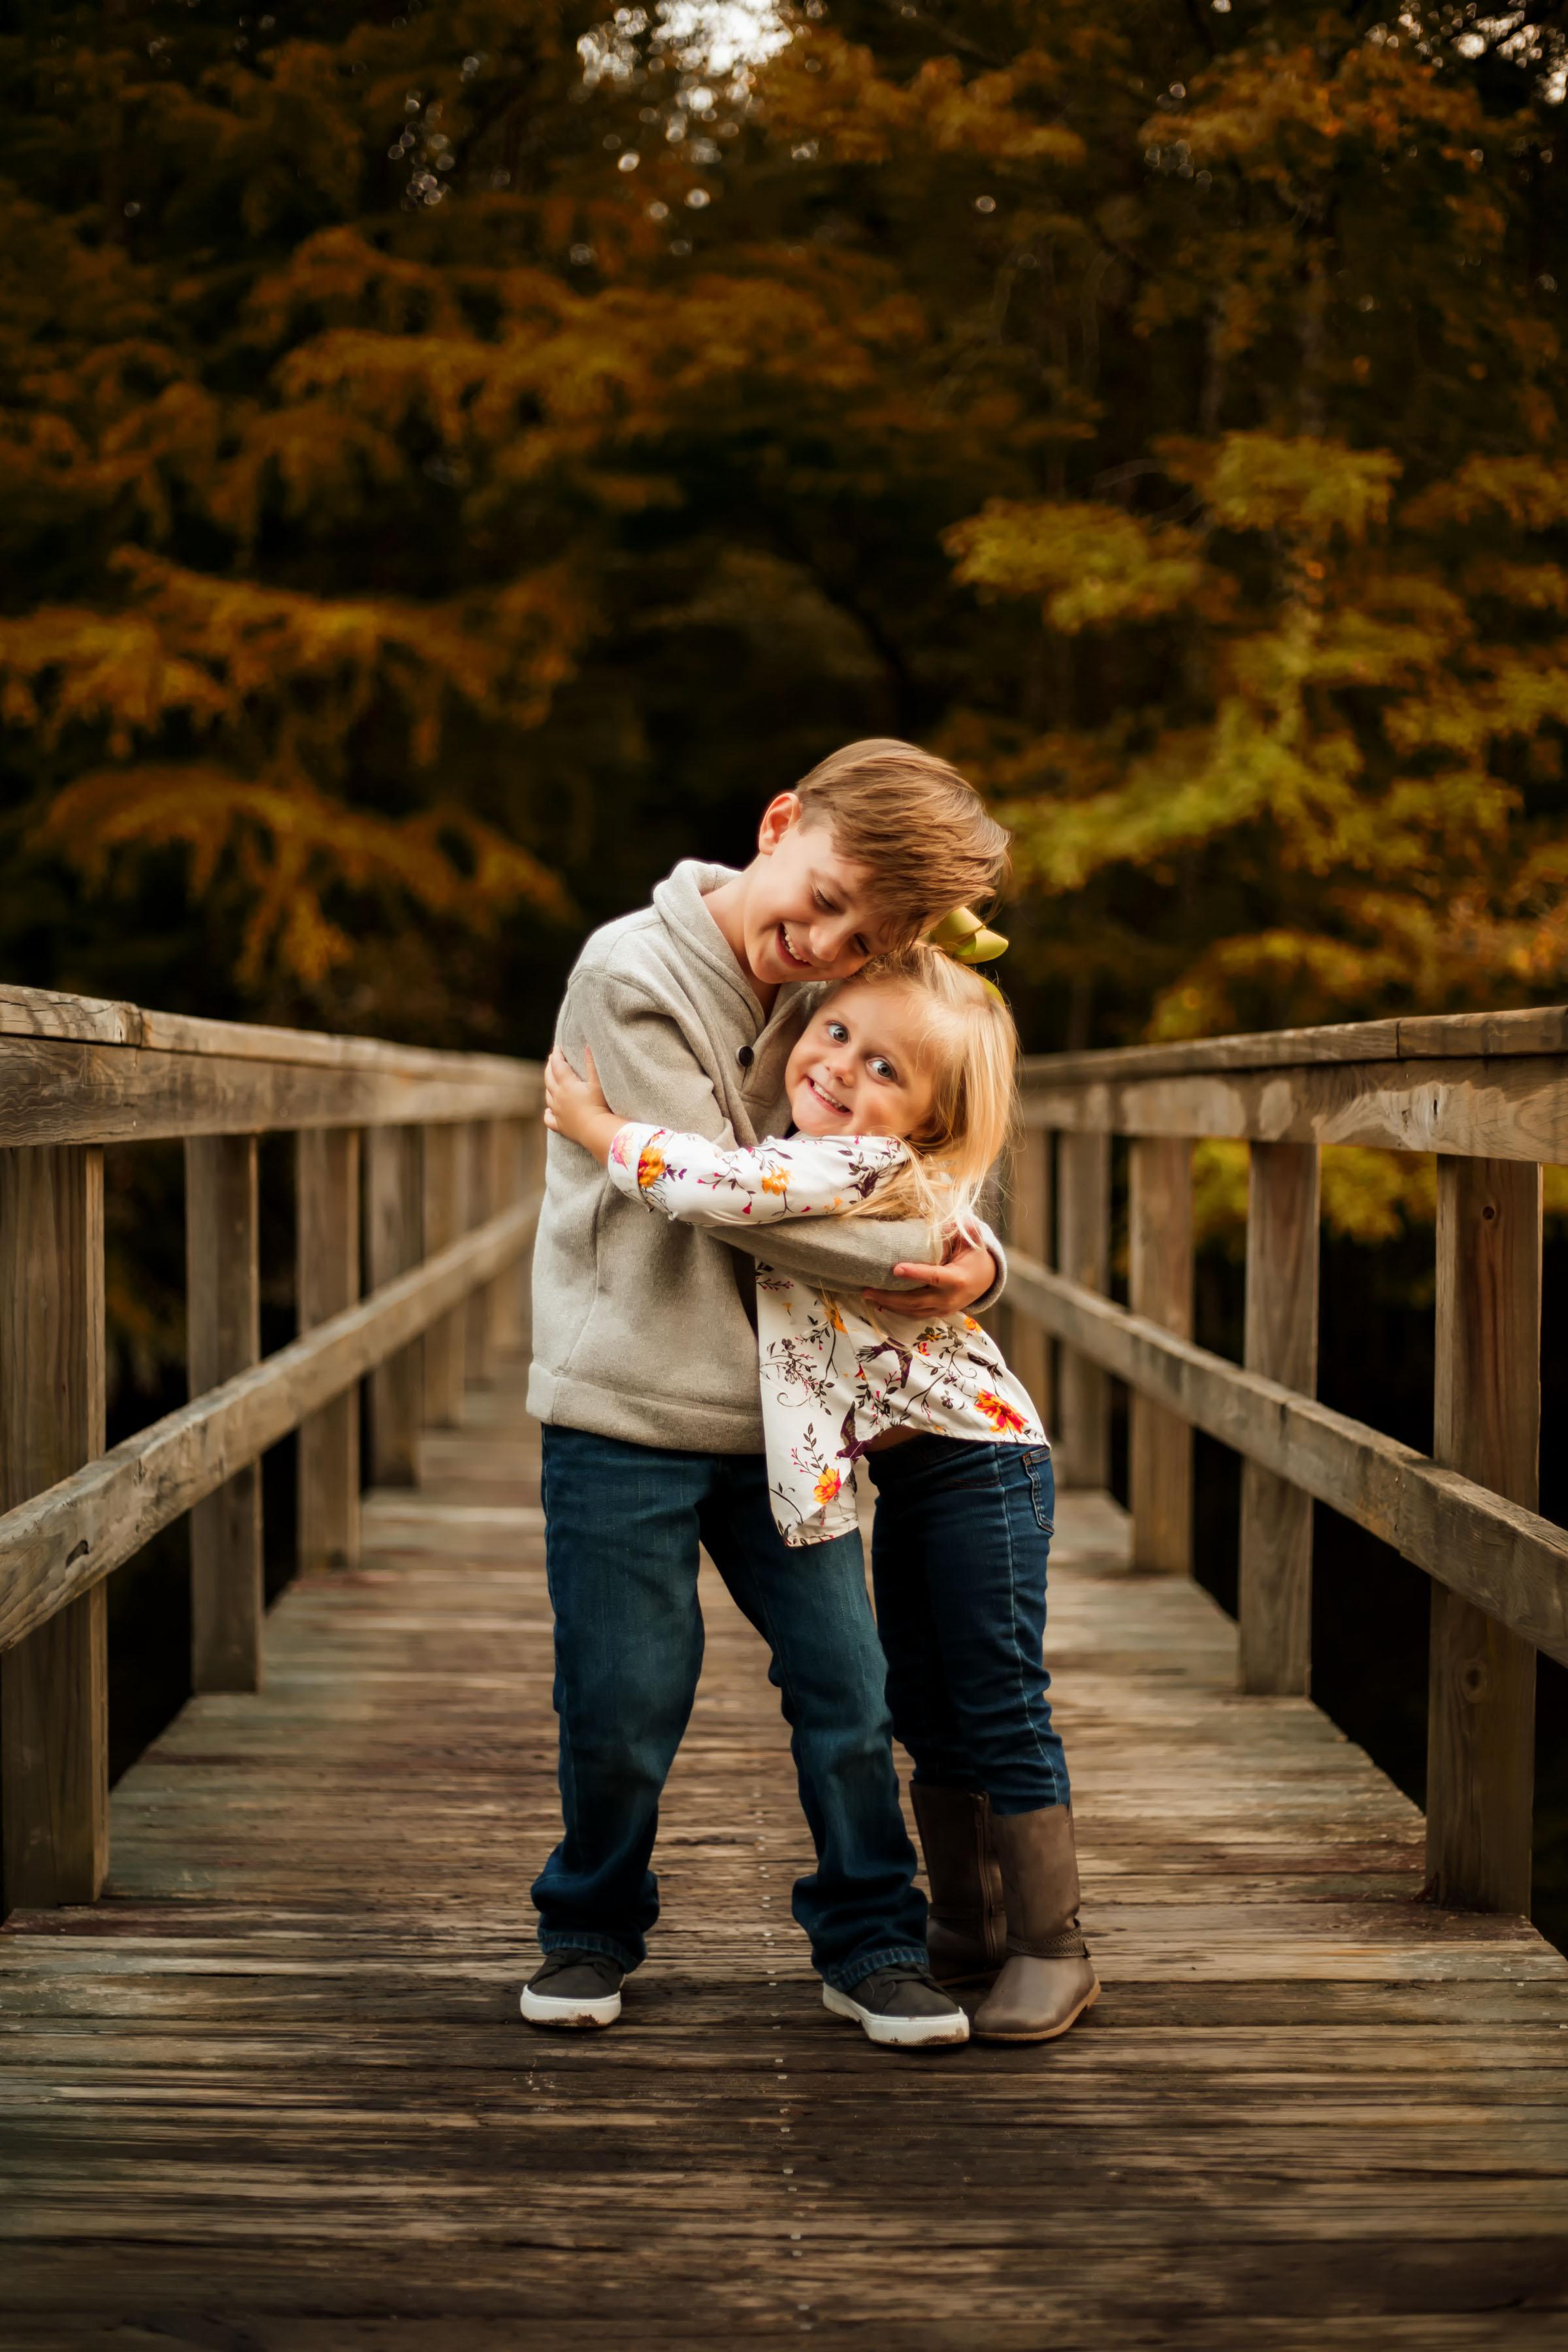 Fall-Woods-Mini-Session-Wilmington-NC-Tiffany-Abruzzo-Photography-14.jpg